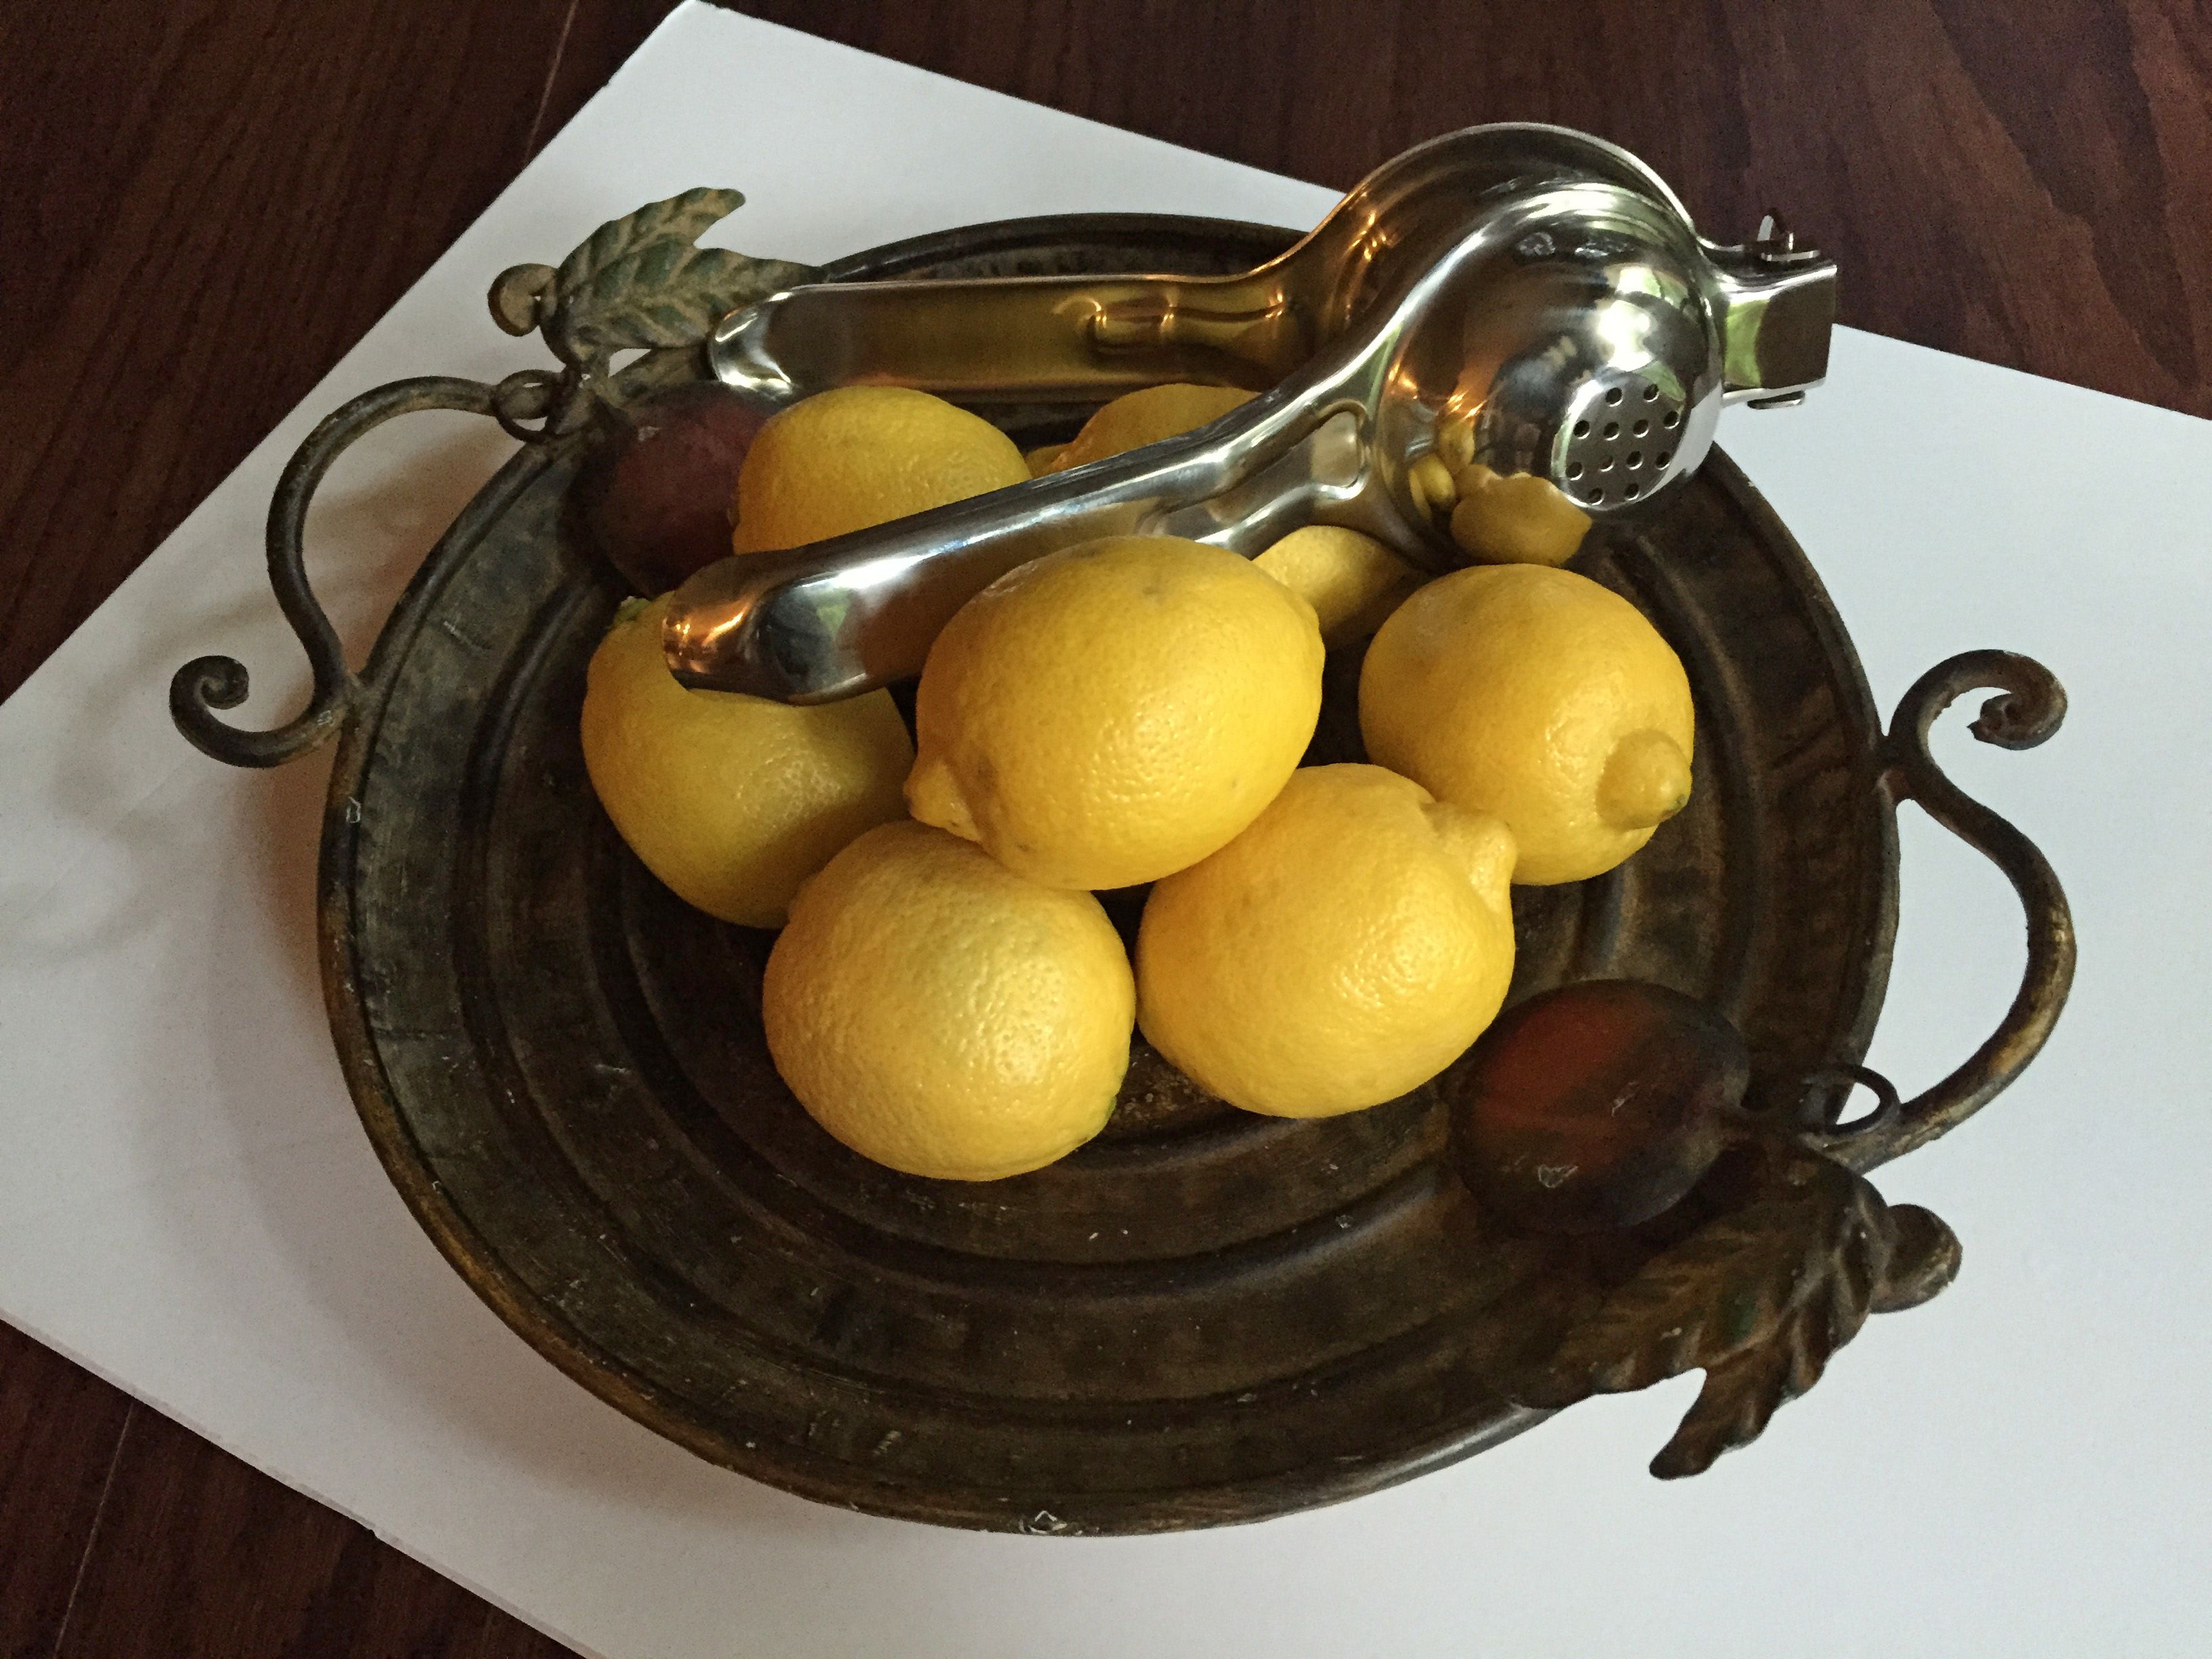 lemons with lemon press on platter, lemon recipes, healthy recipes